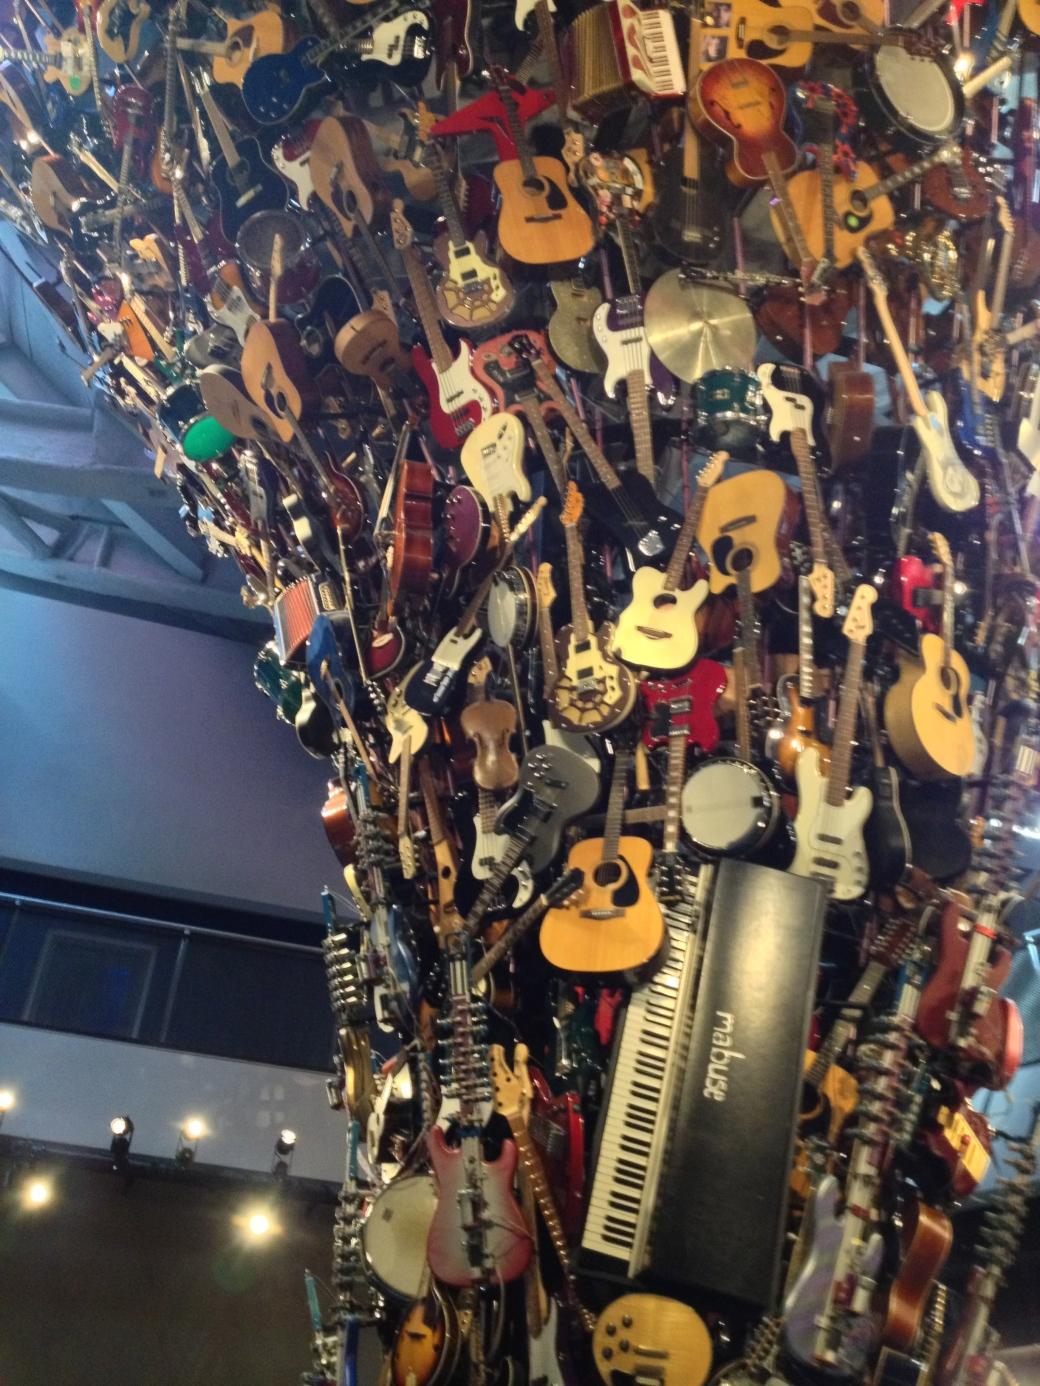 Instrument sculpture in EMP - over 700 instruments!